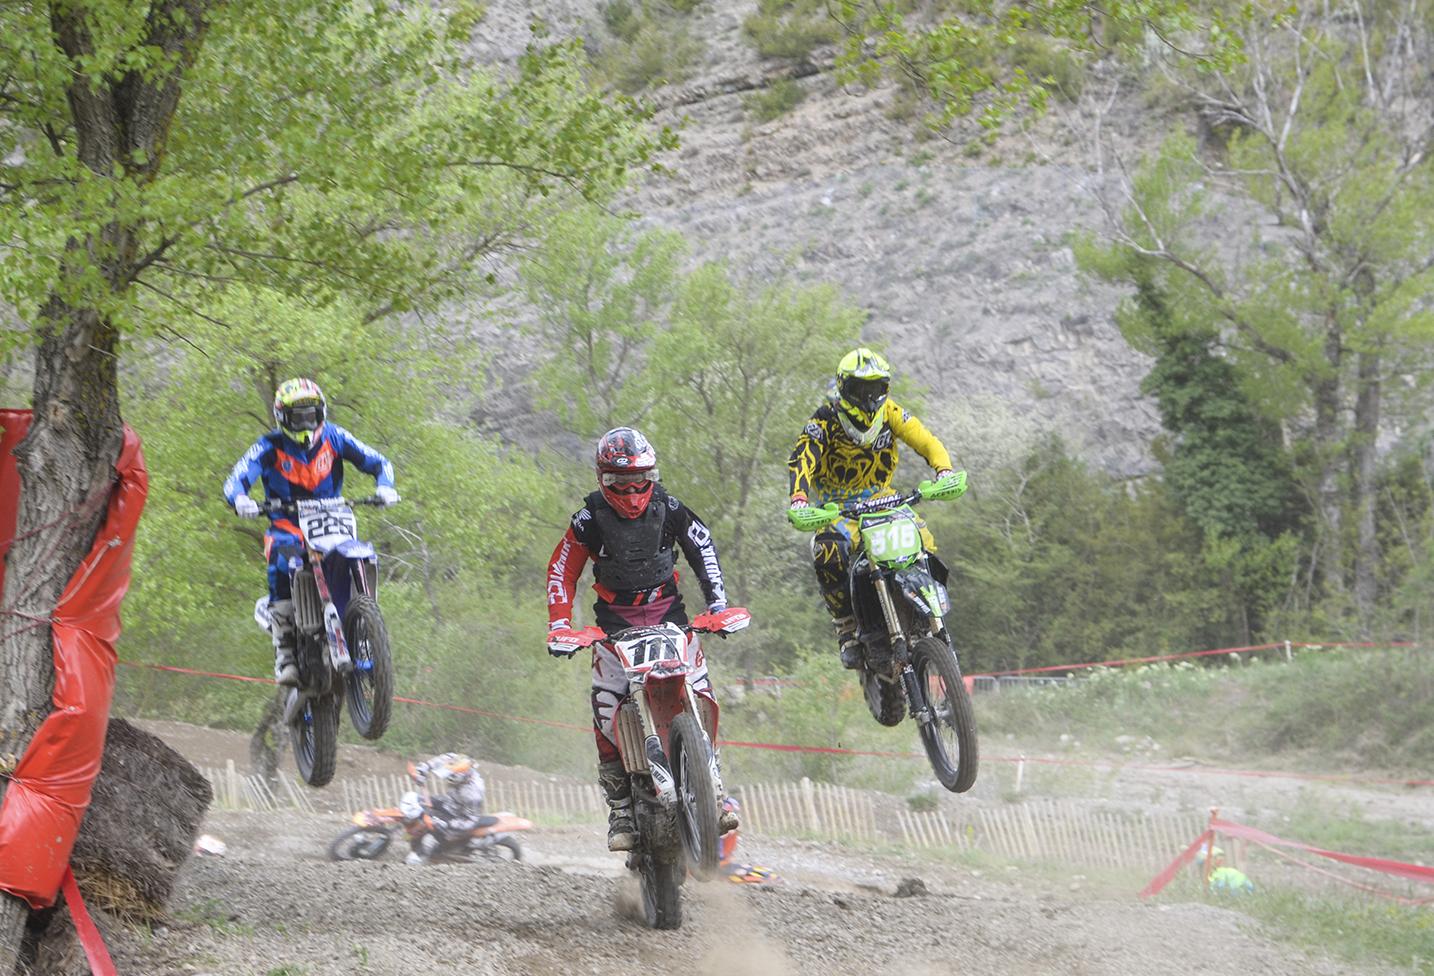 Compétition de moto-cross de la Calade